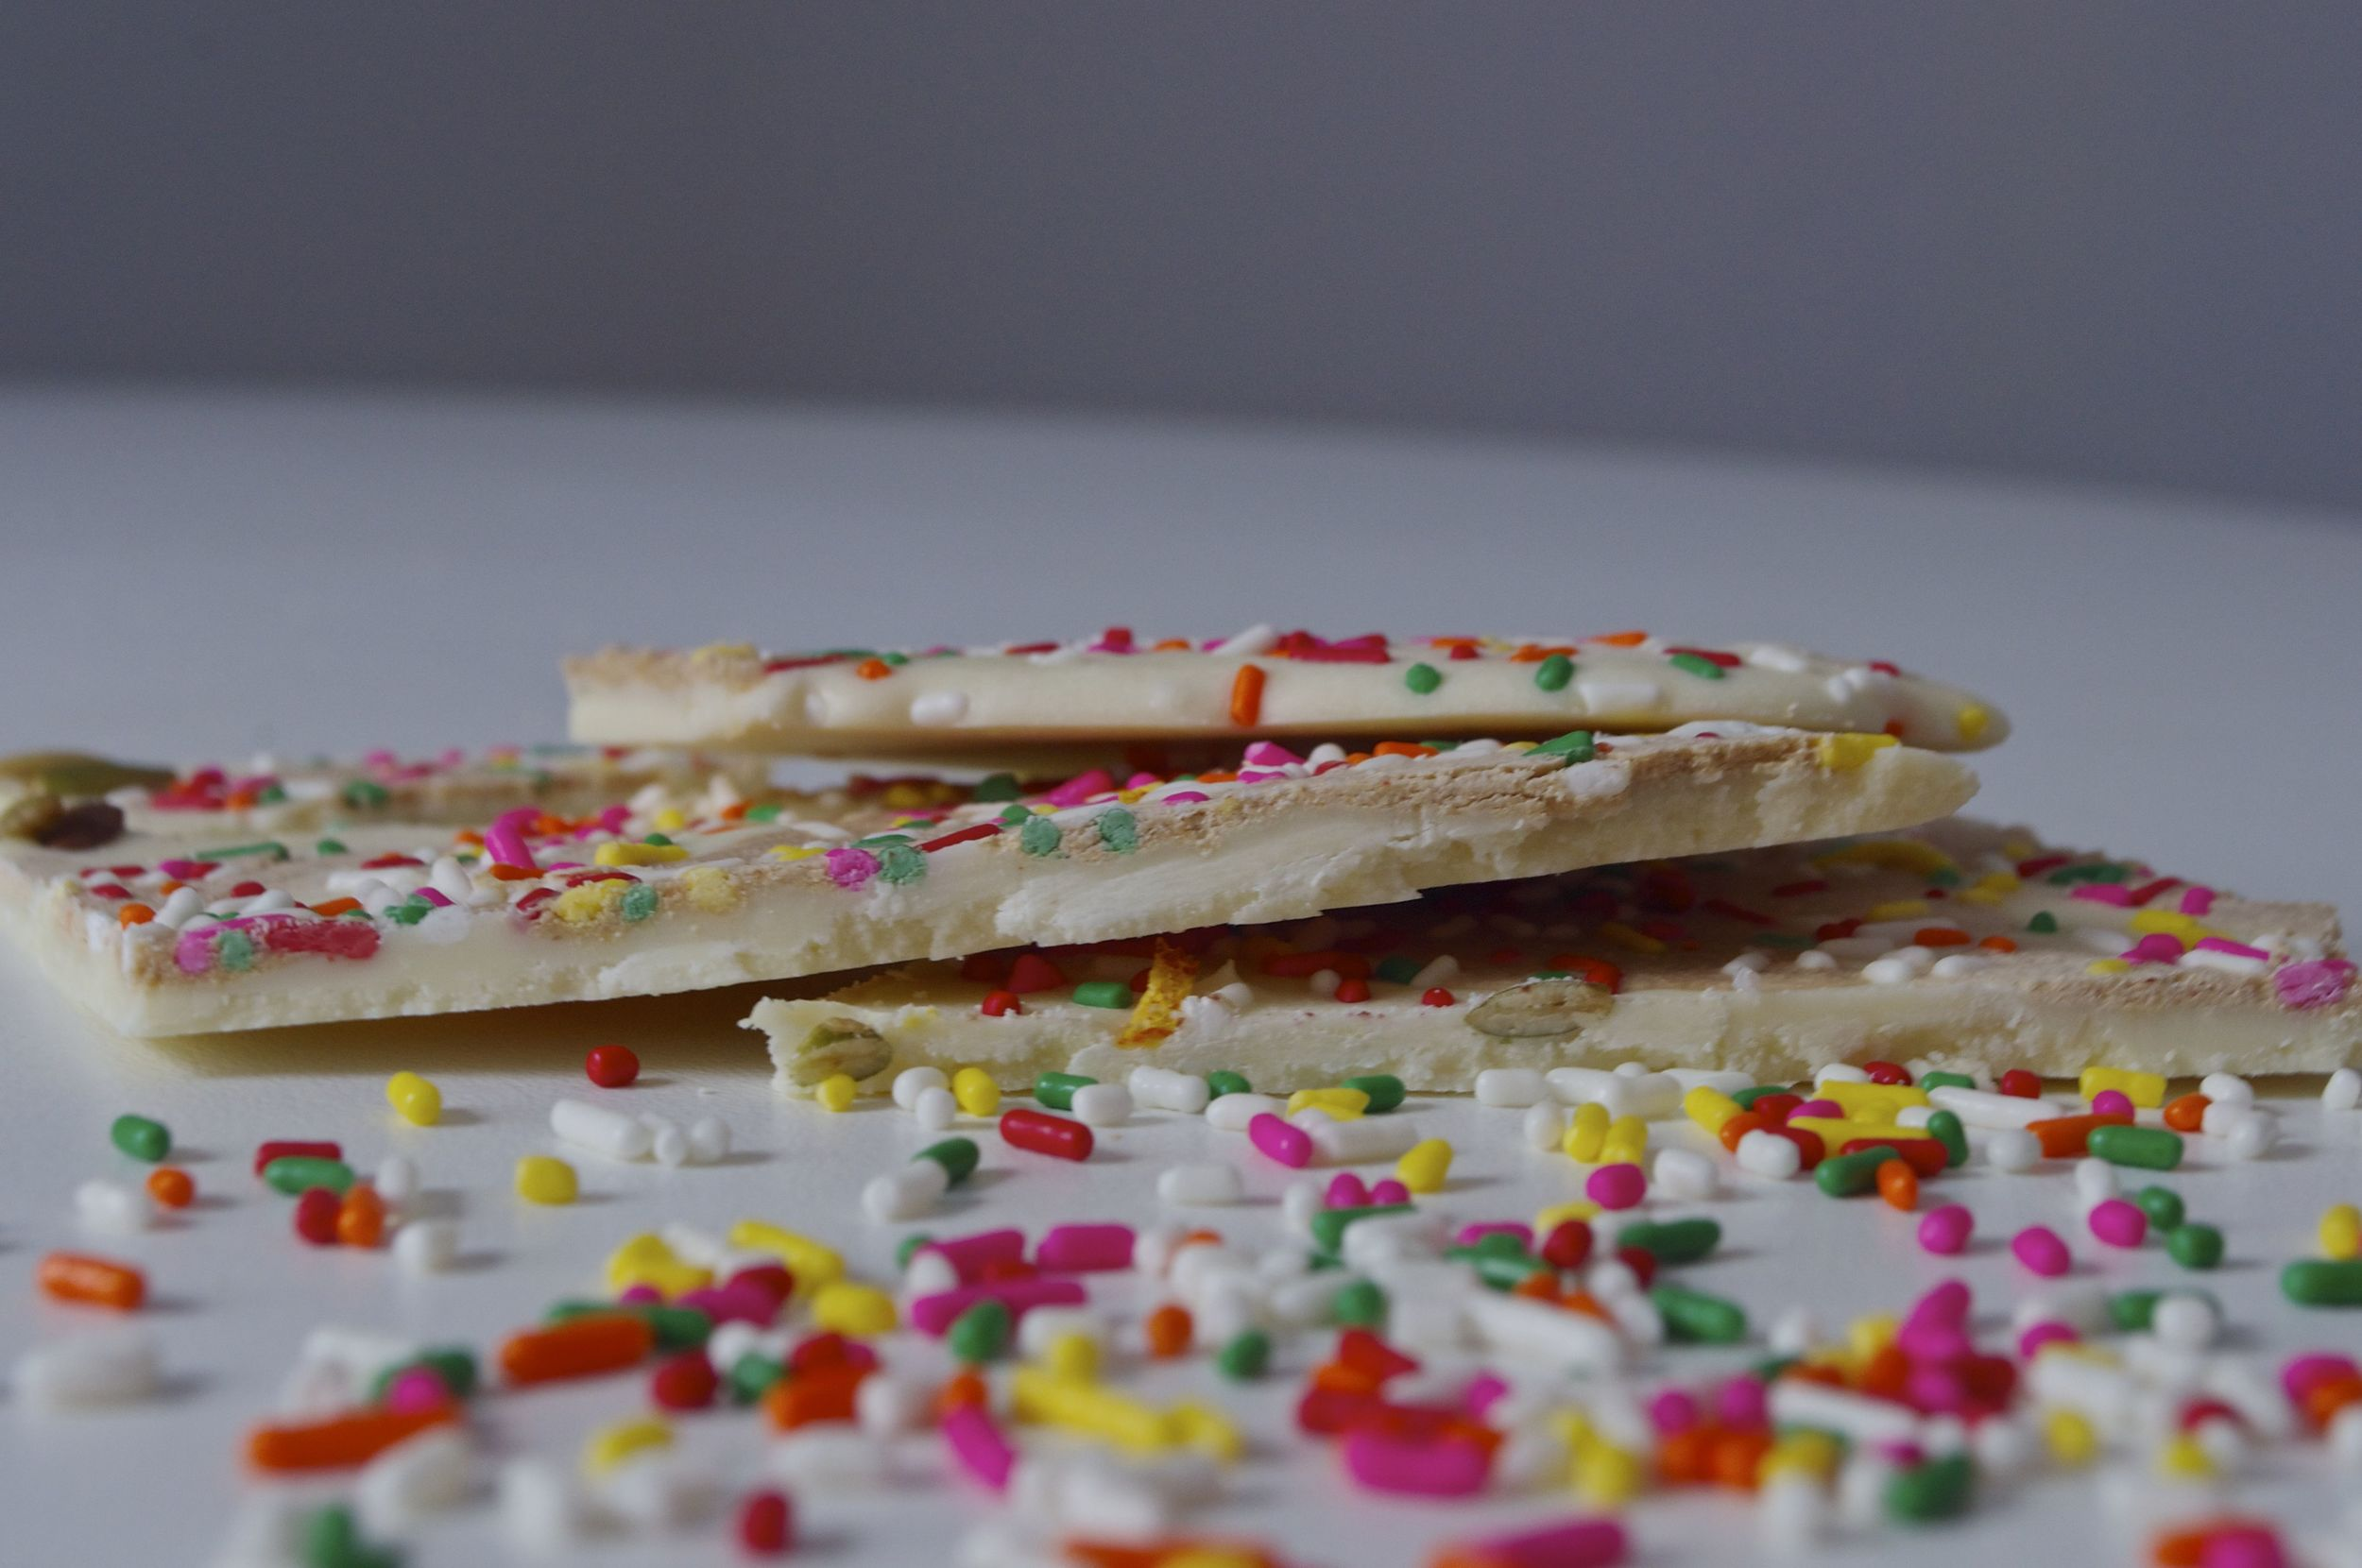 tahini-sprinkle-chocolate-bark-fried-parsley